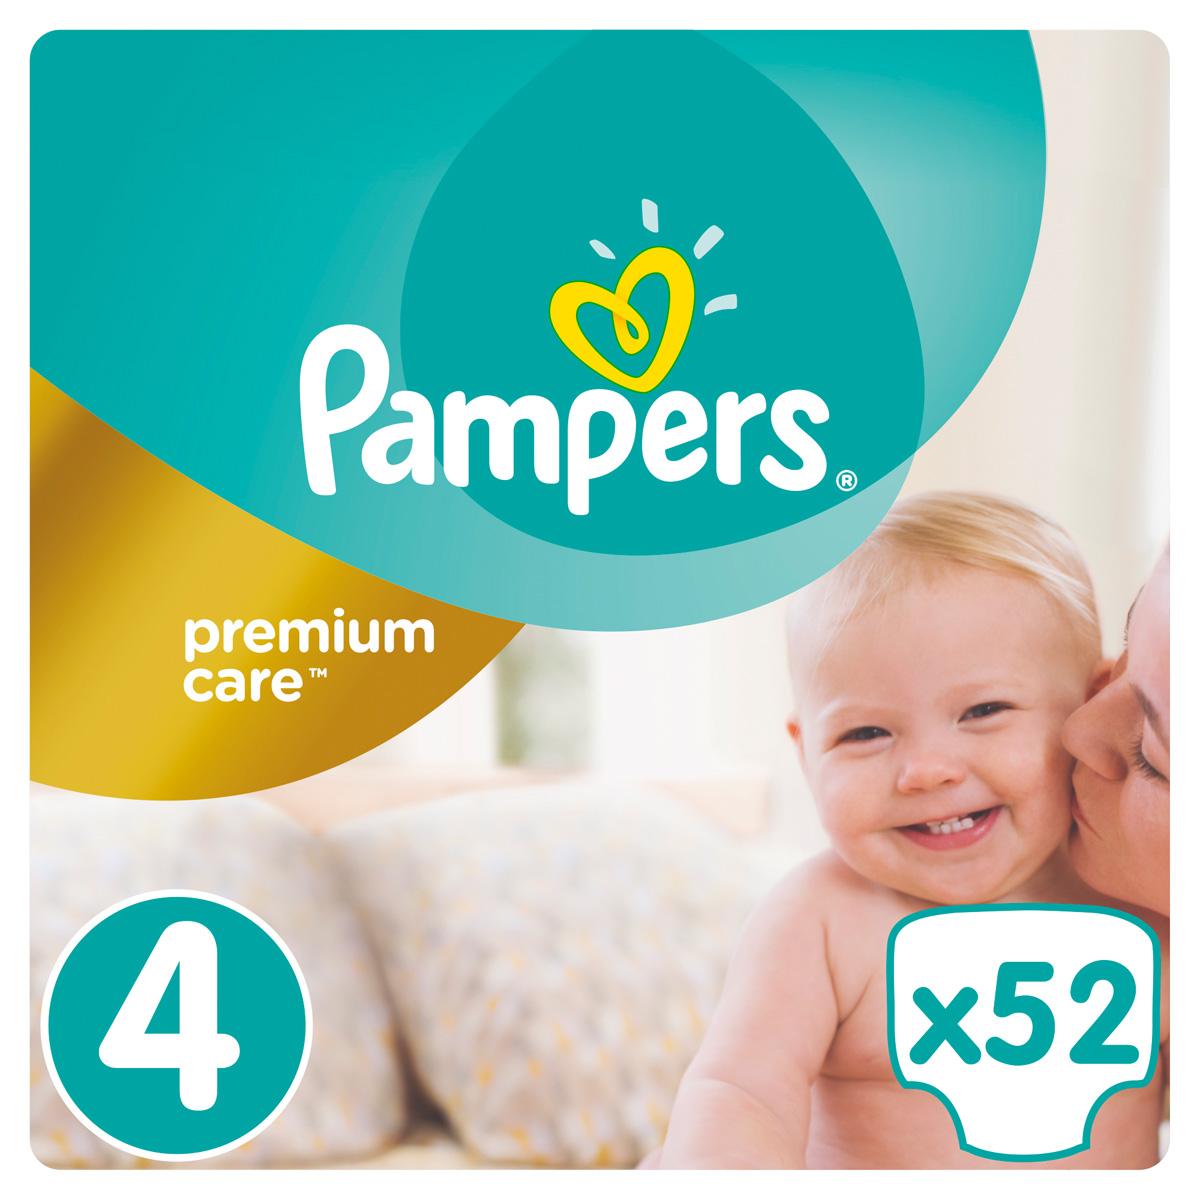 Pampers Premium Care Подгузники 4, 7-18 кг, 52 шт - Подгузники и пеленки